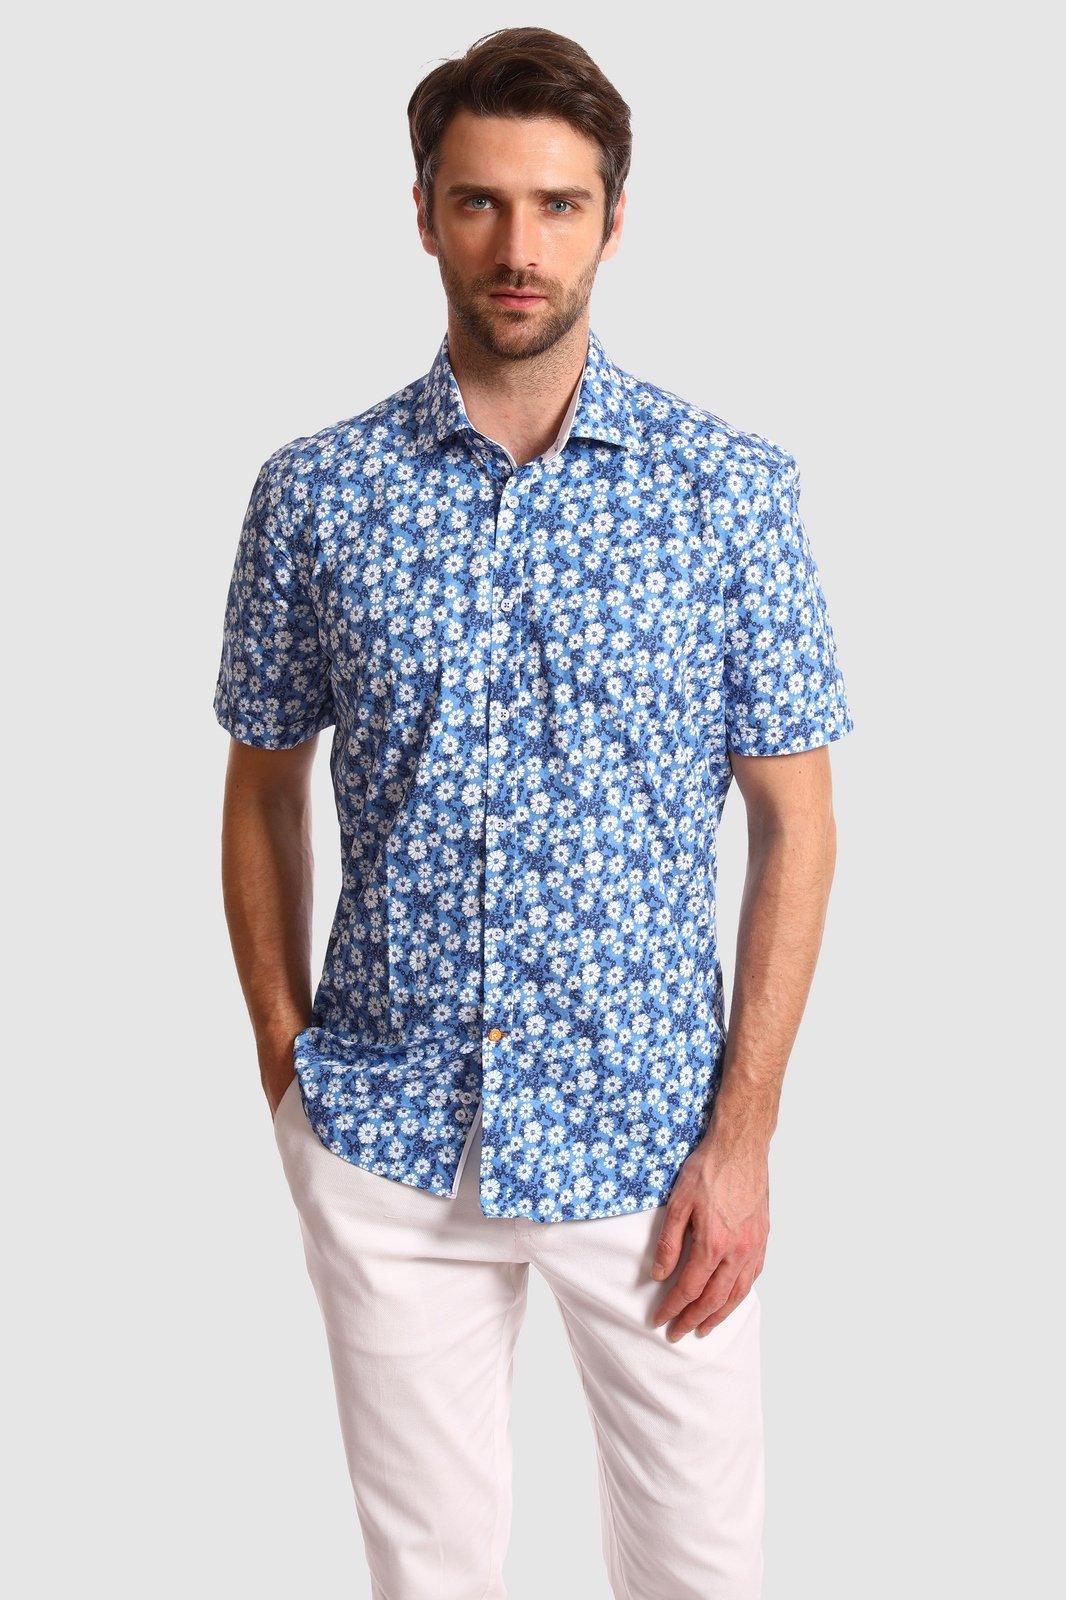 Рубашка мужская Kanzler 20S-SW11SSS/02-4 голубая 54 RU